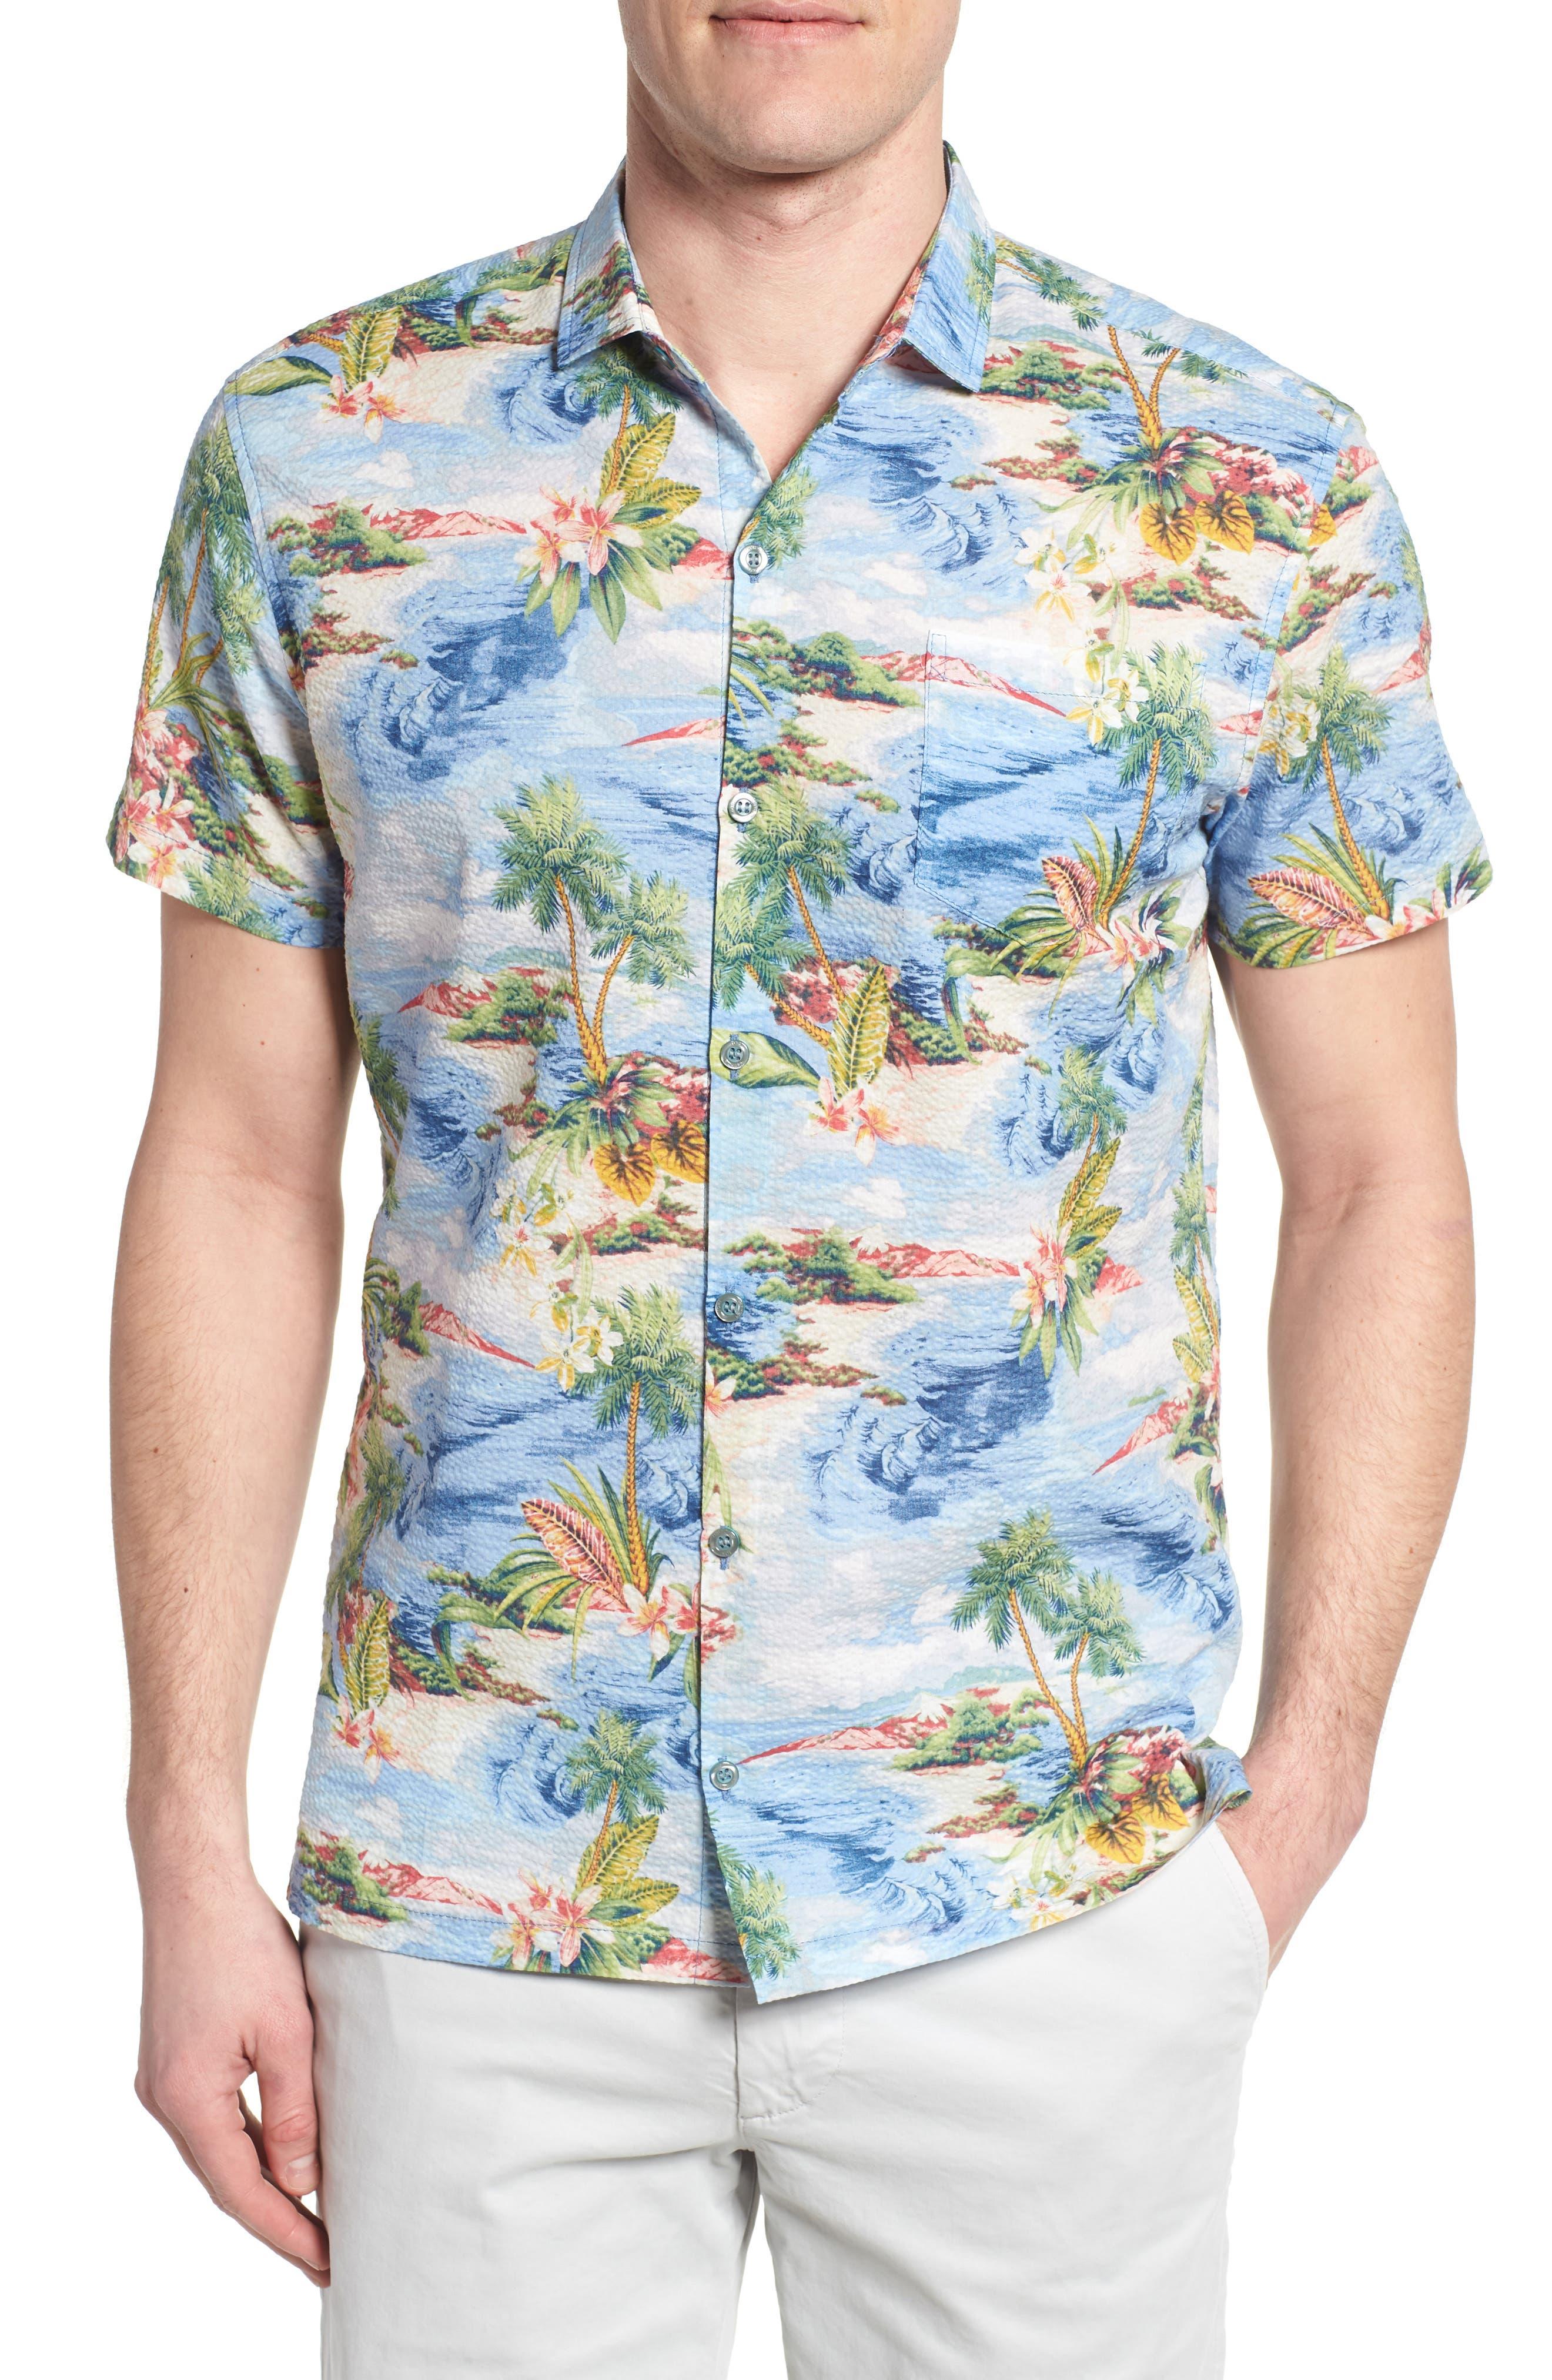 TORI RICHARD Private Isle Trim Fit Camp Shirt, Main, color, 476